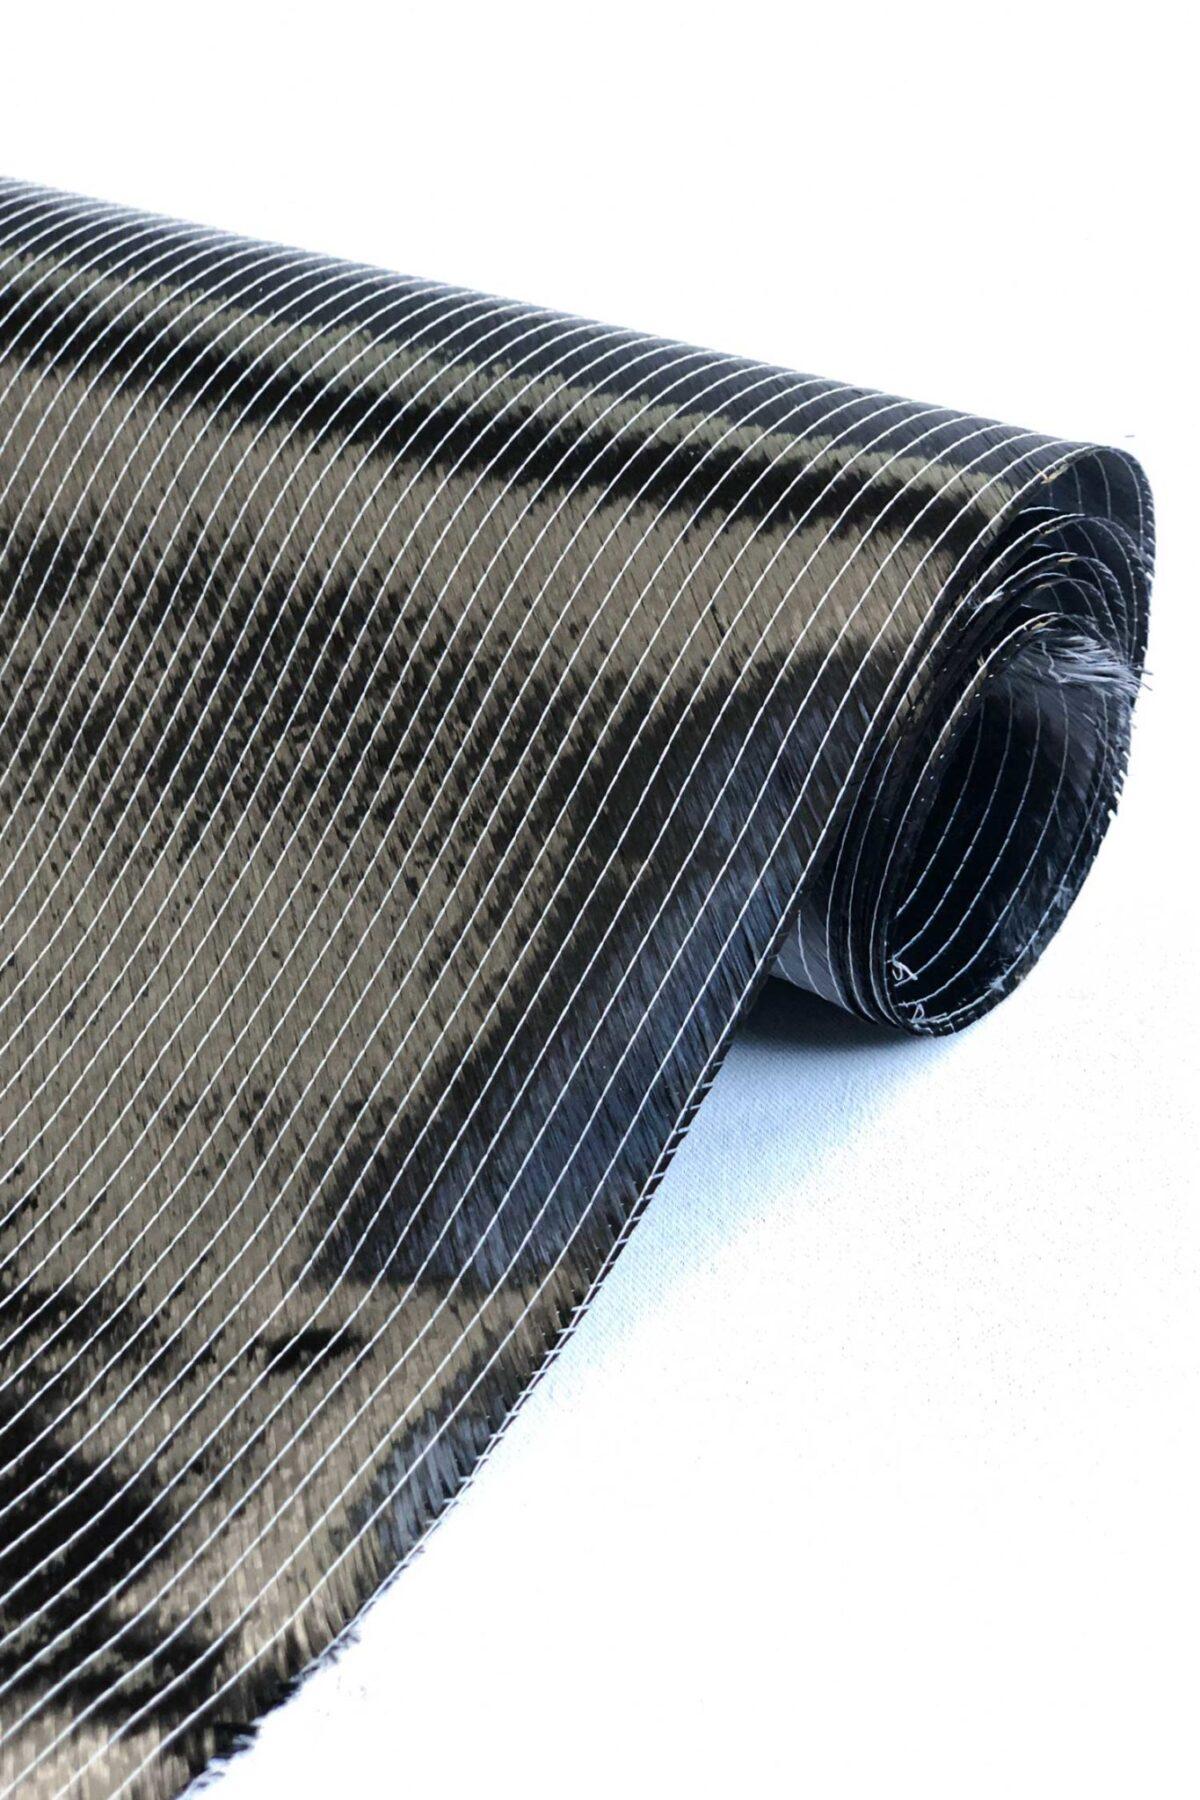 Tissu Carbone biaxial 200gr/m2 pour fabriquer ses skis, splitboard ou snowboard